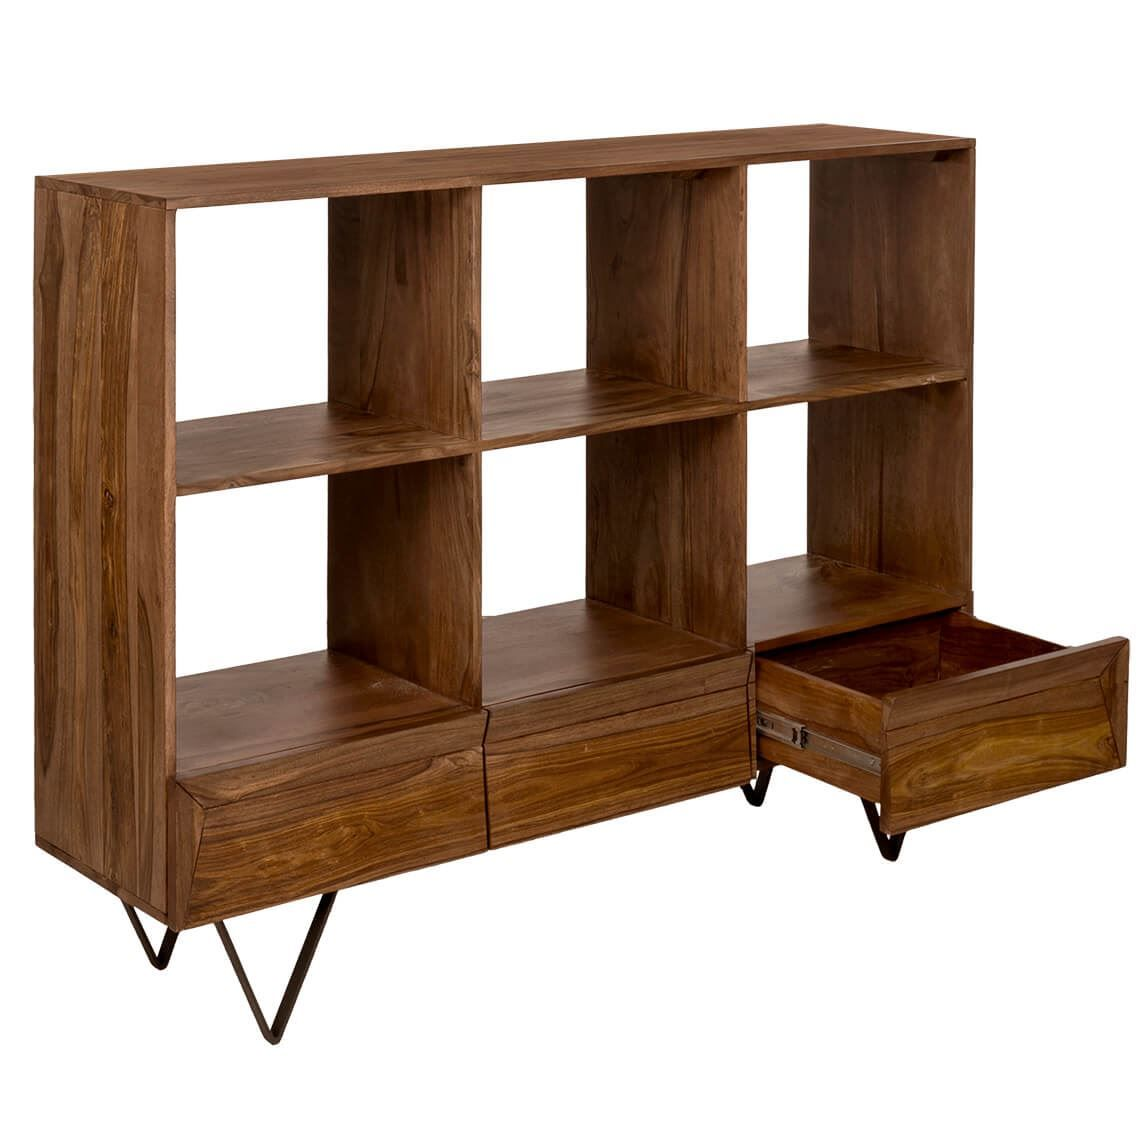 Wyatt 6 Cube 3 Drawer Shelving Unit Natural Shelving Unit Living Room Furniture Modern Furniture Living Room